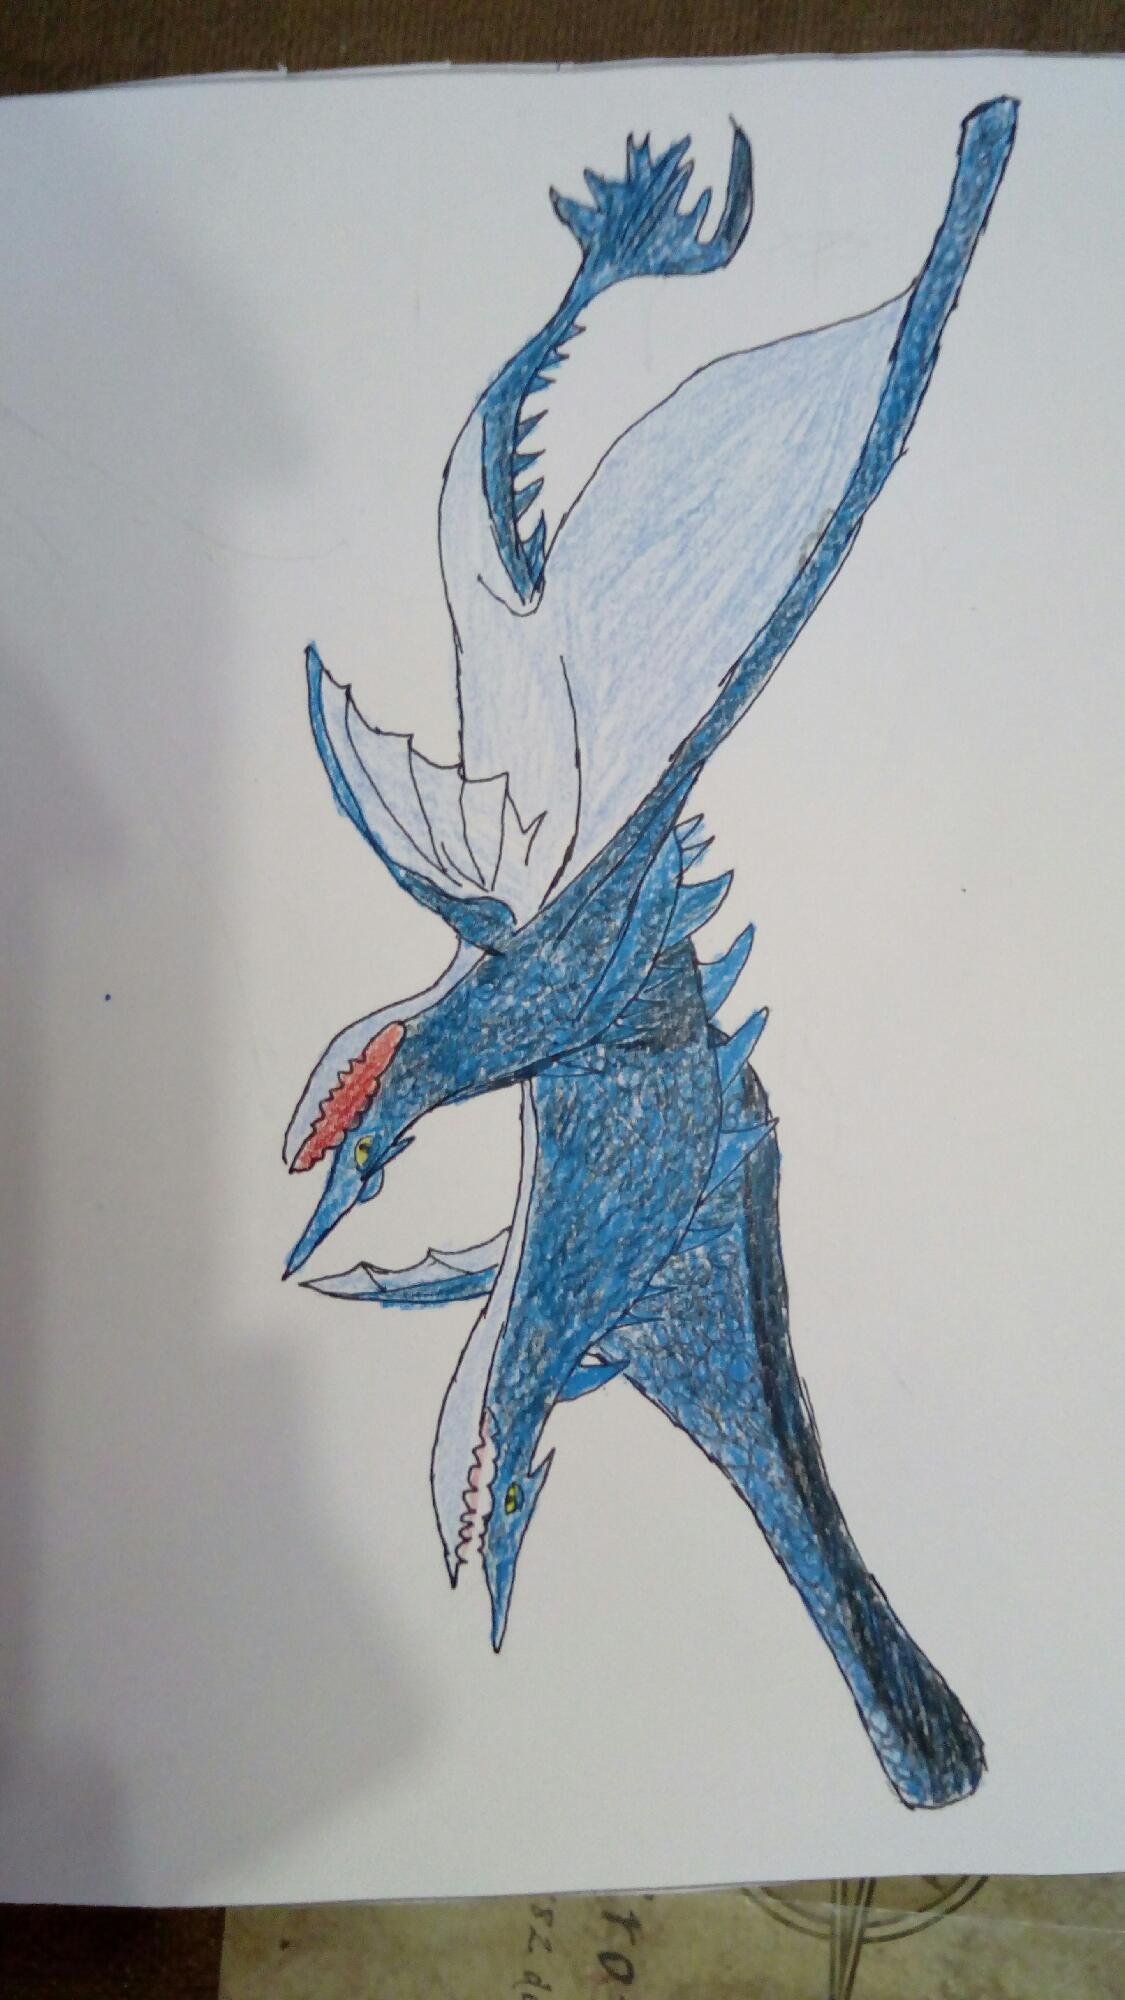 Dibujo de libro de dragones: shock marino.